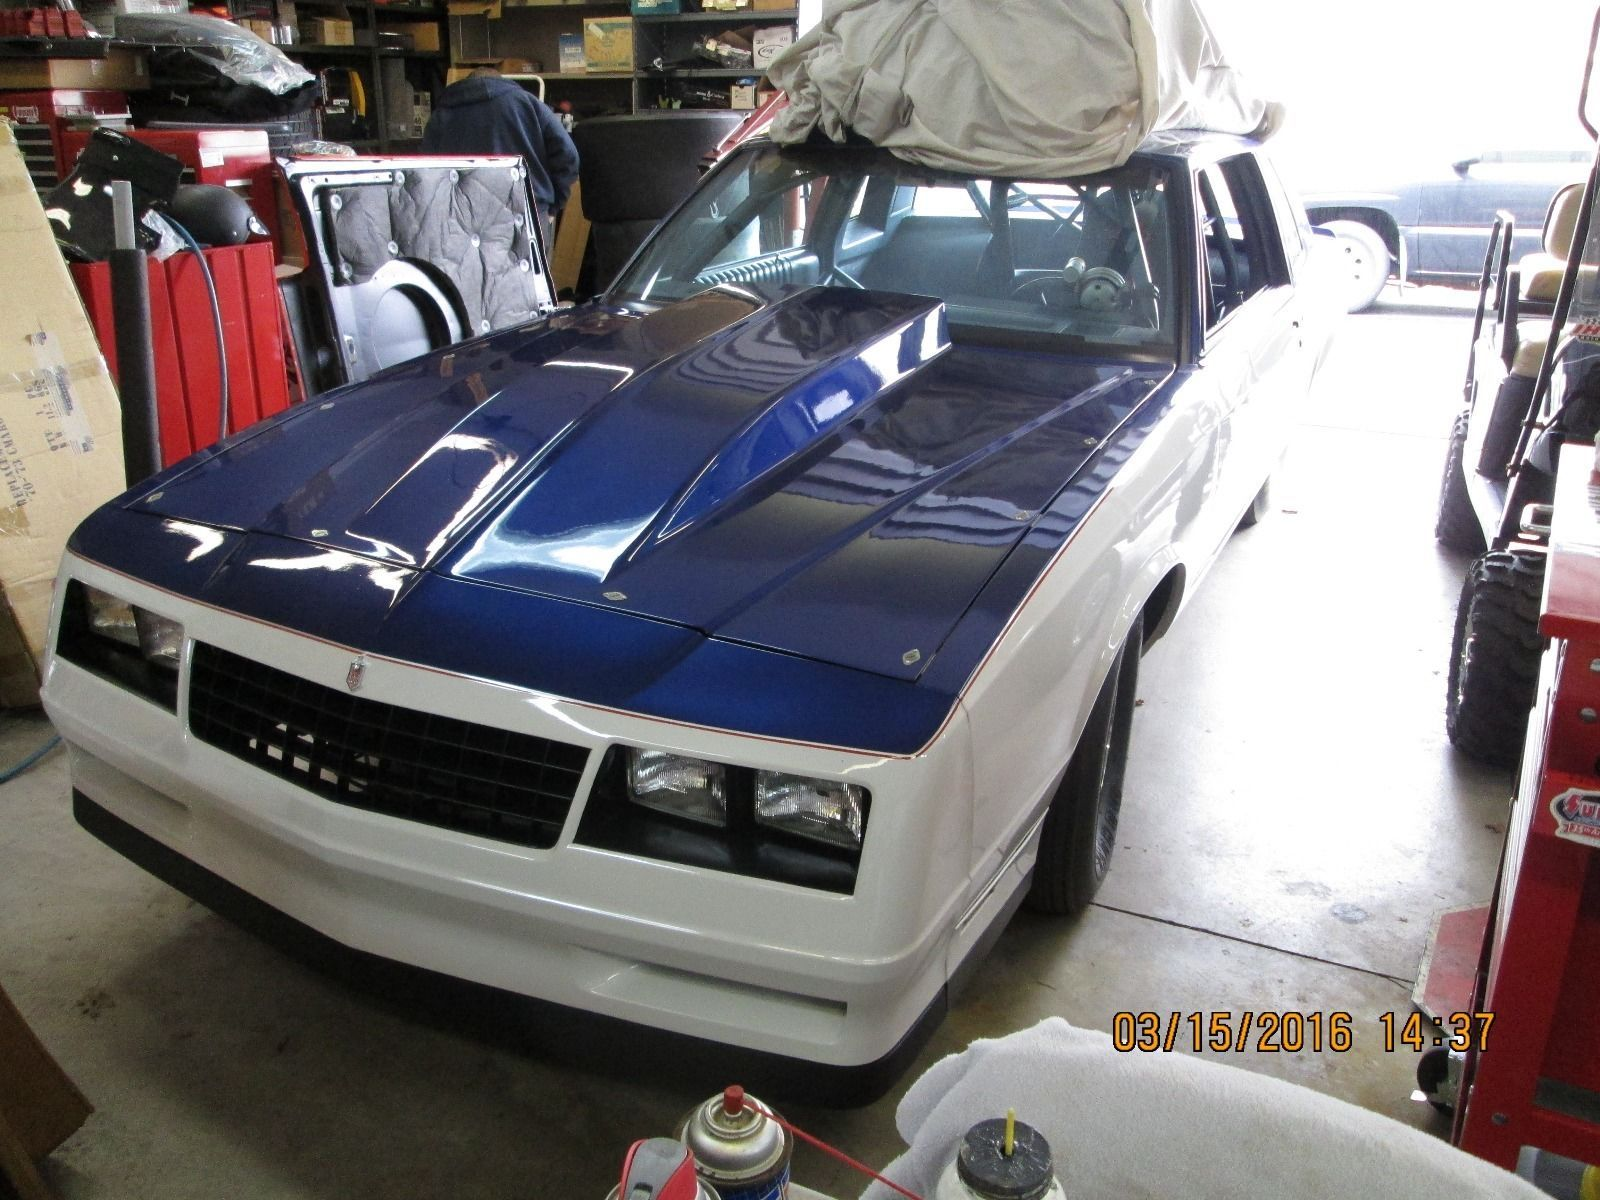 1984 Chevrolet Monte Carlo SS Race Car | Race cars for sale ...